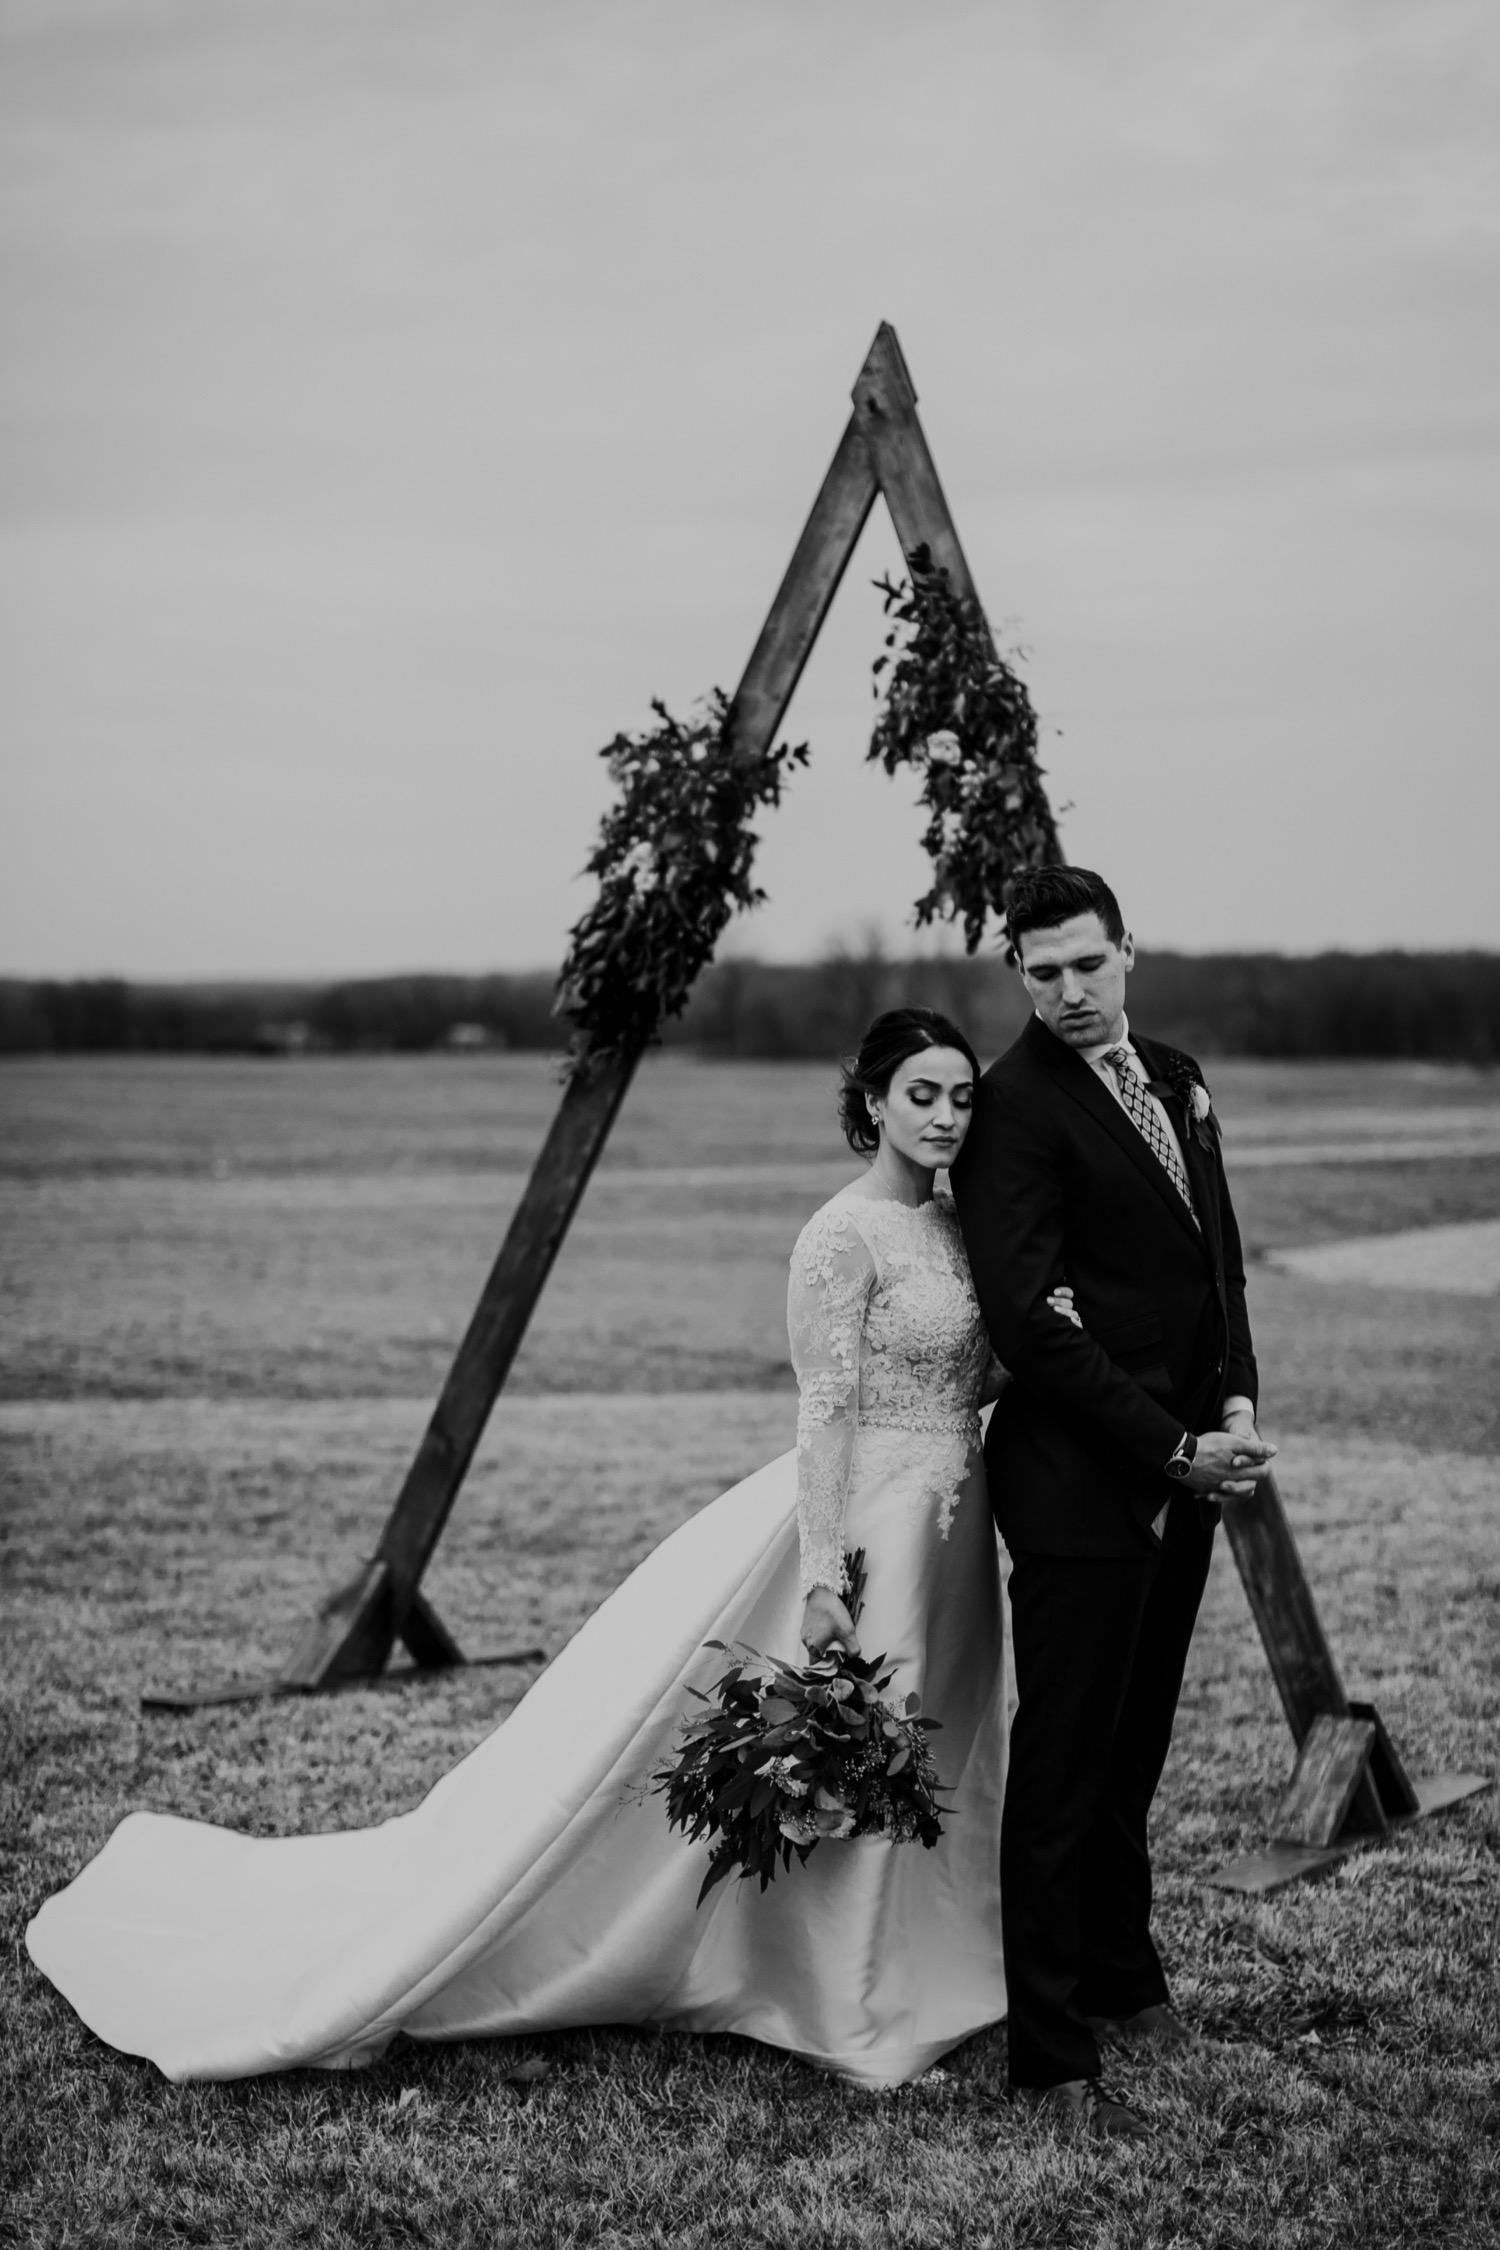 077_Hennings-1288_Kansas_Kelsey_Missouri_Center_Wedding_Diane_Photography_Marshall_Jackson's_Event_City.jpg